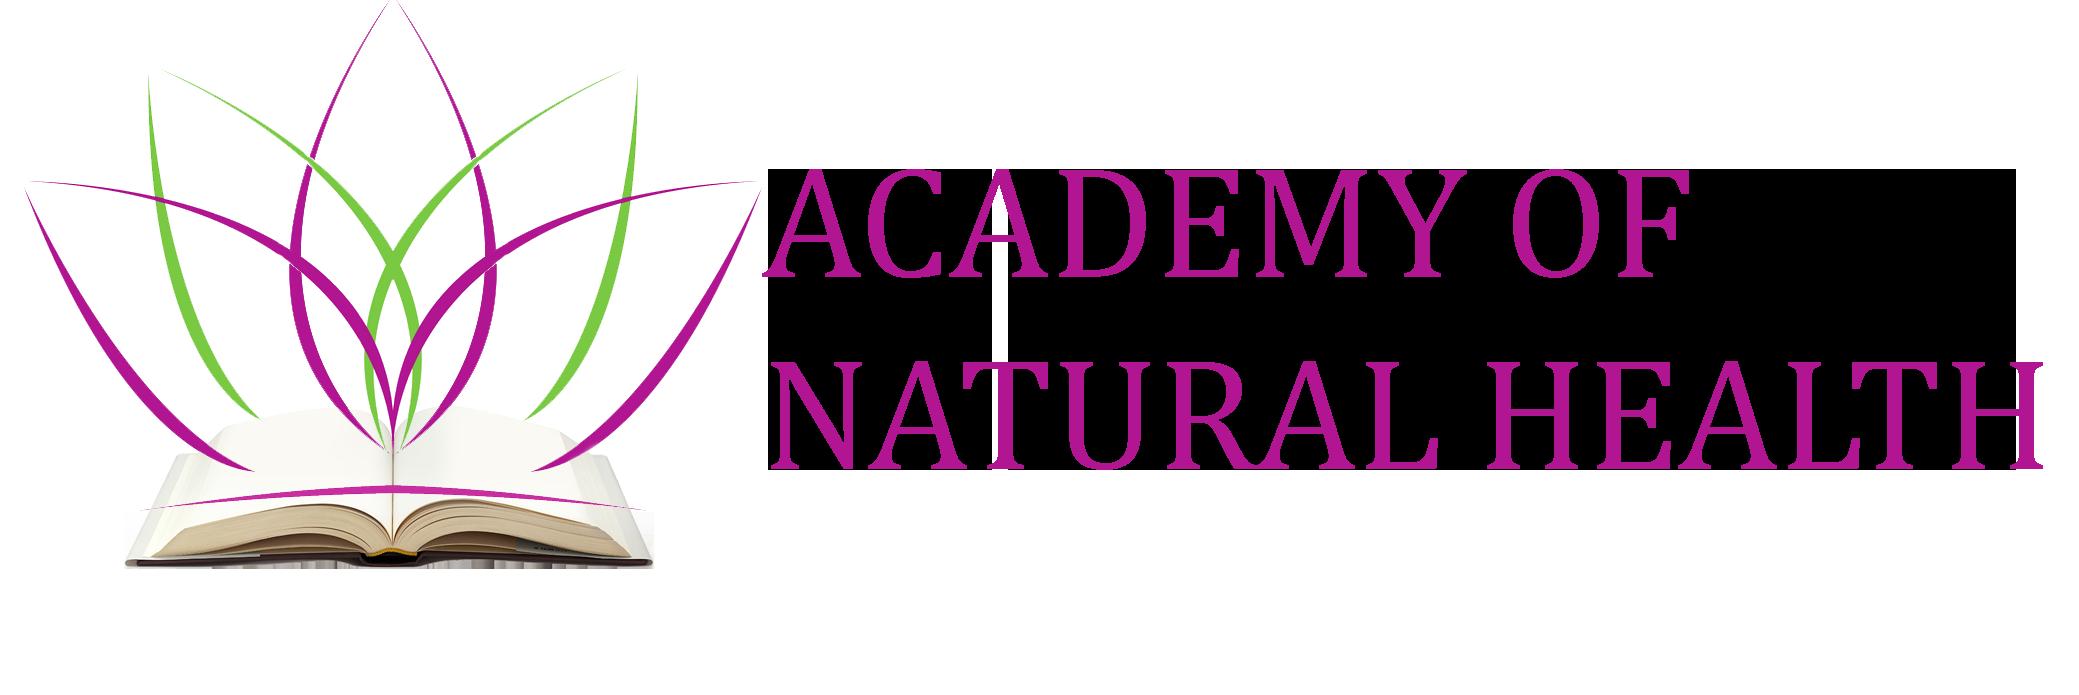 Darowizna na cele statutowe dla Academy of Natural Health